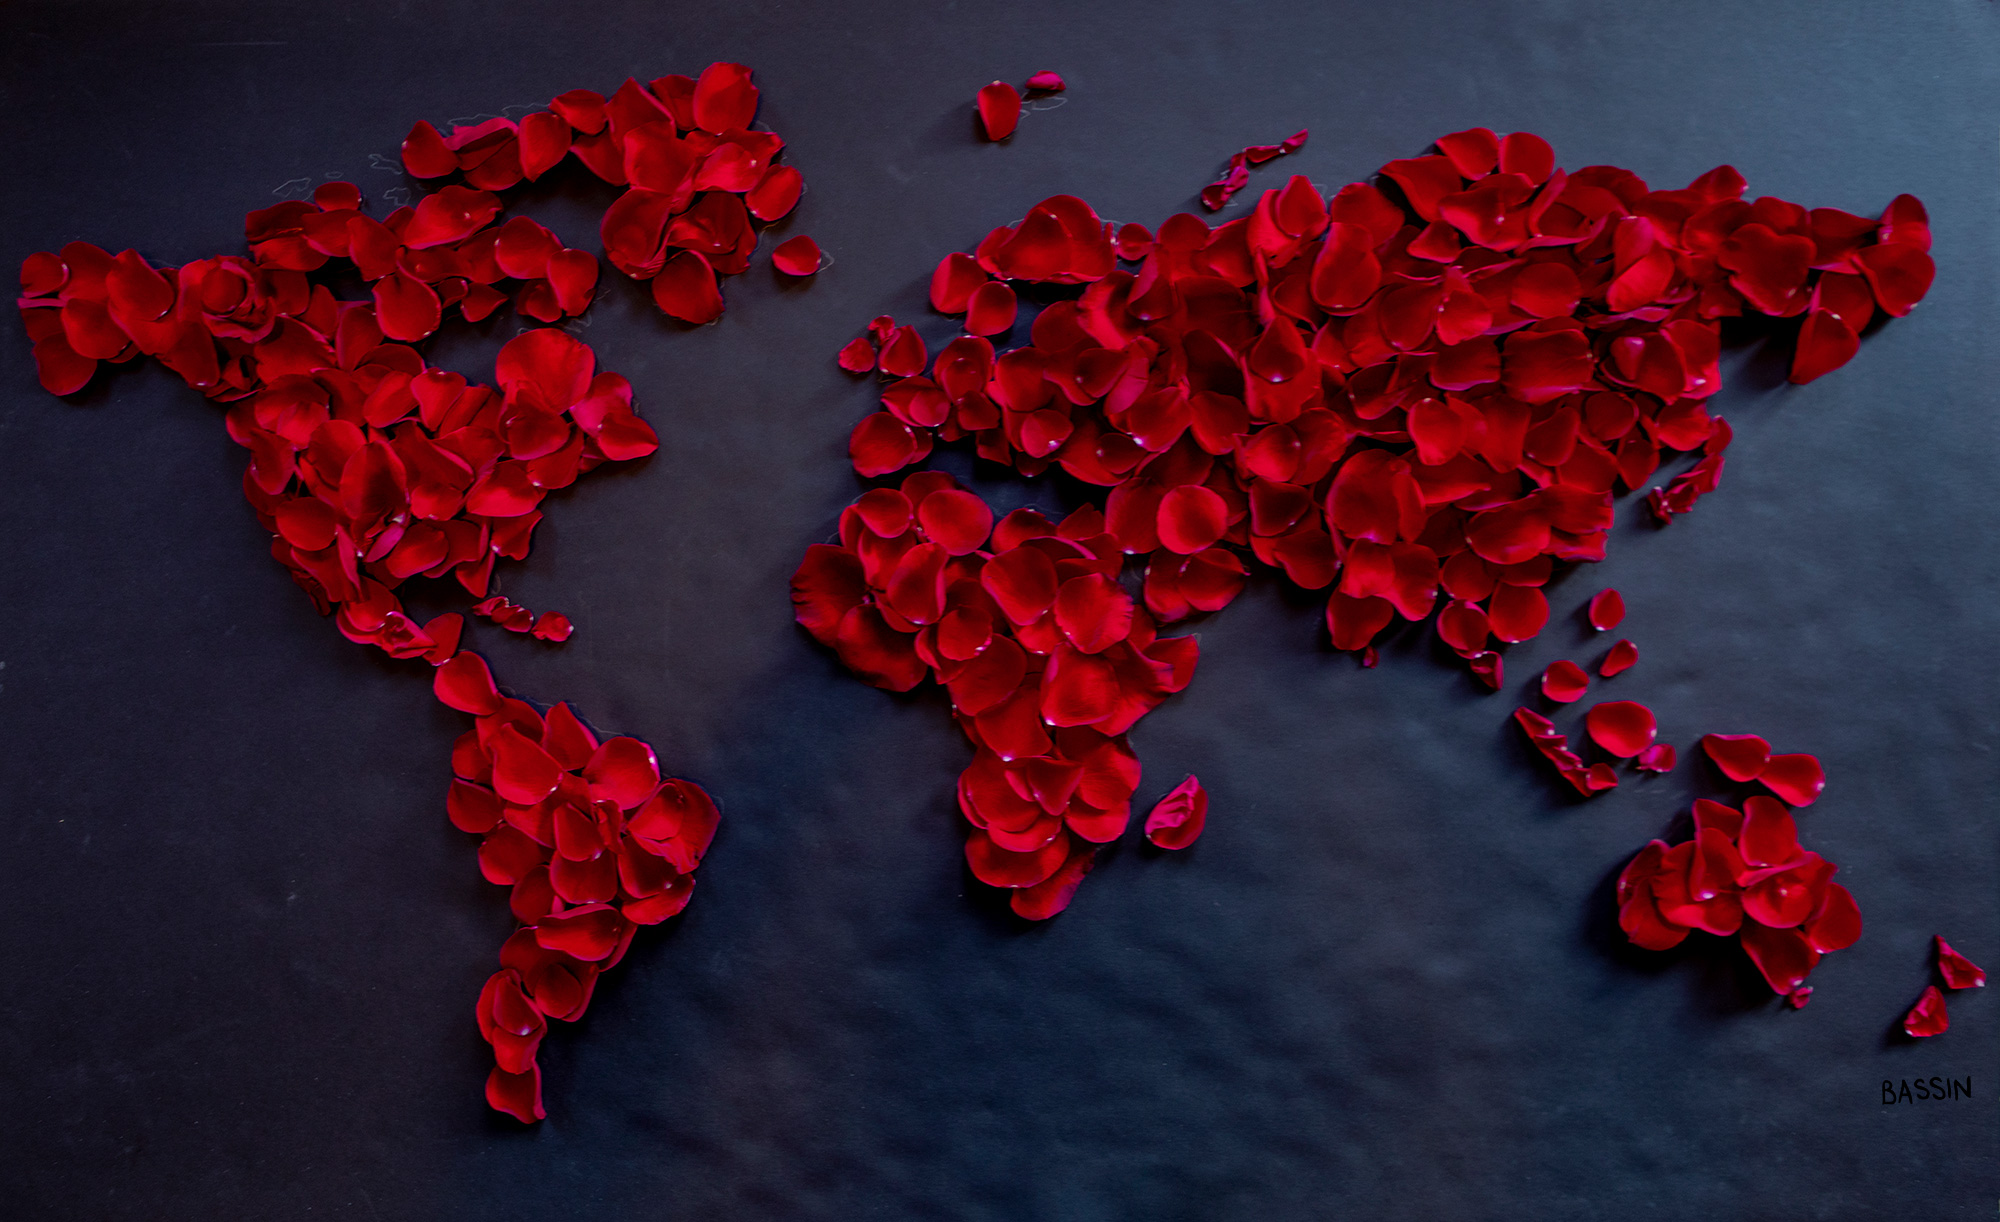 W+W_red_rose_petals_on_black_2000.jpg